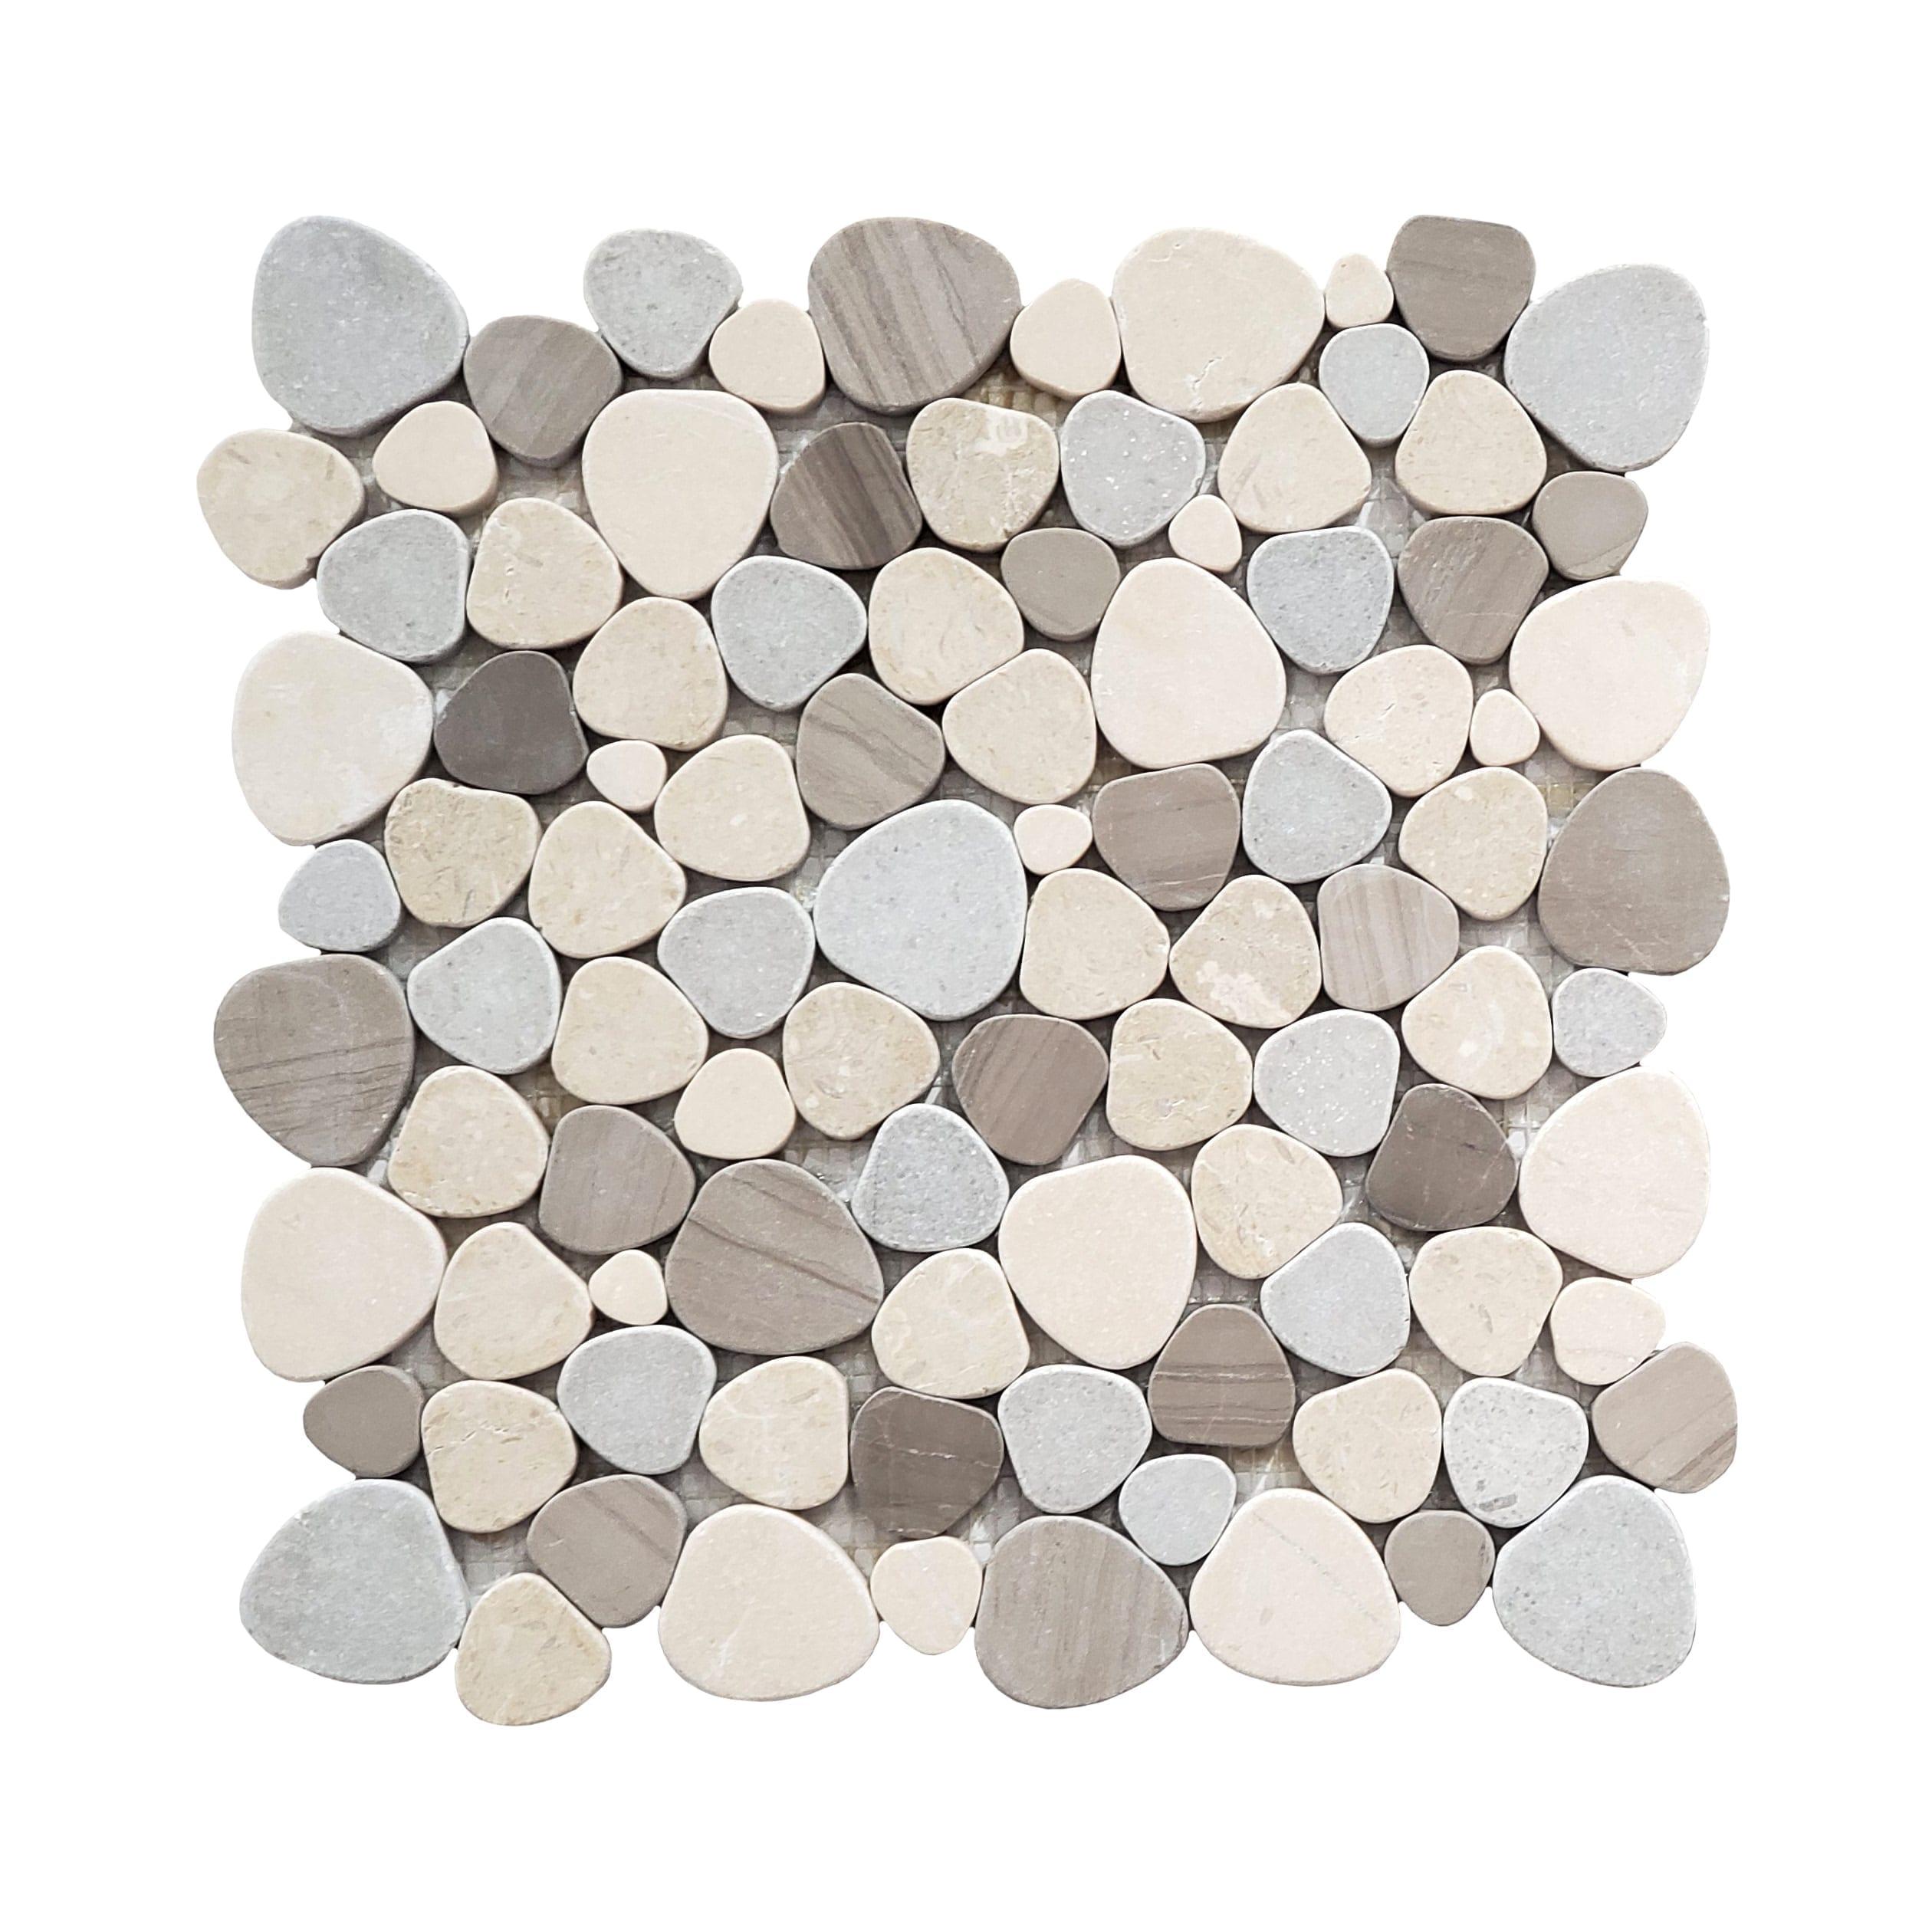 12×12 Palm Beach Mosaic_Stone Matte_14.99